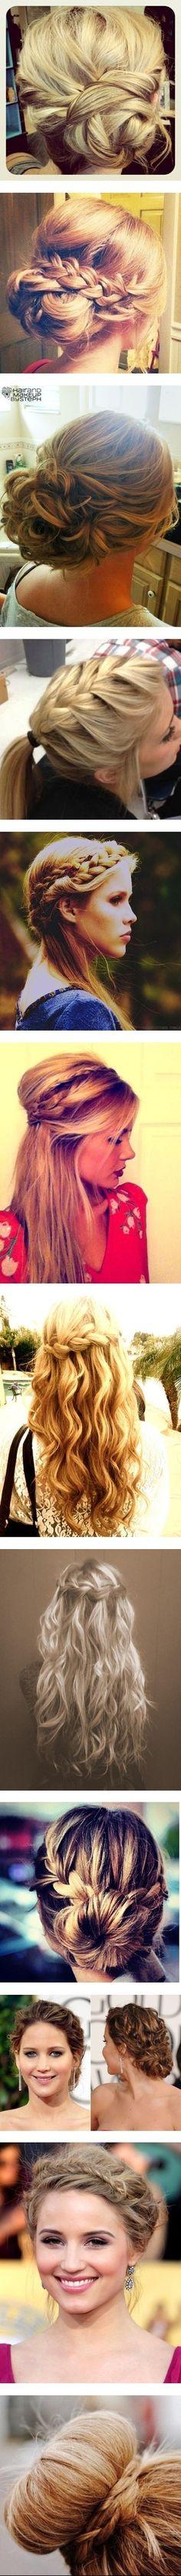 """Braided Hair Buns"" top 3 for | http://newhairstylesforgirls.blogspot.com"